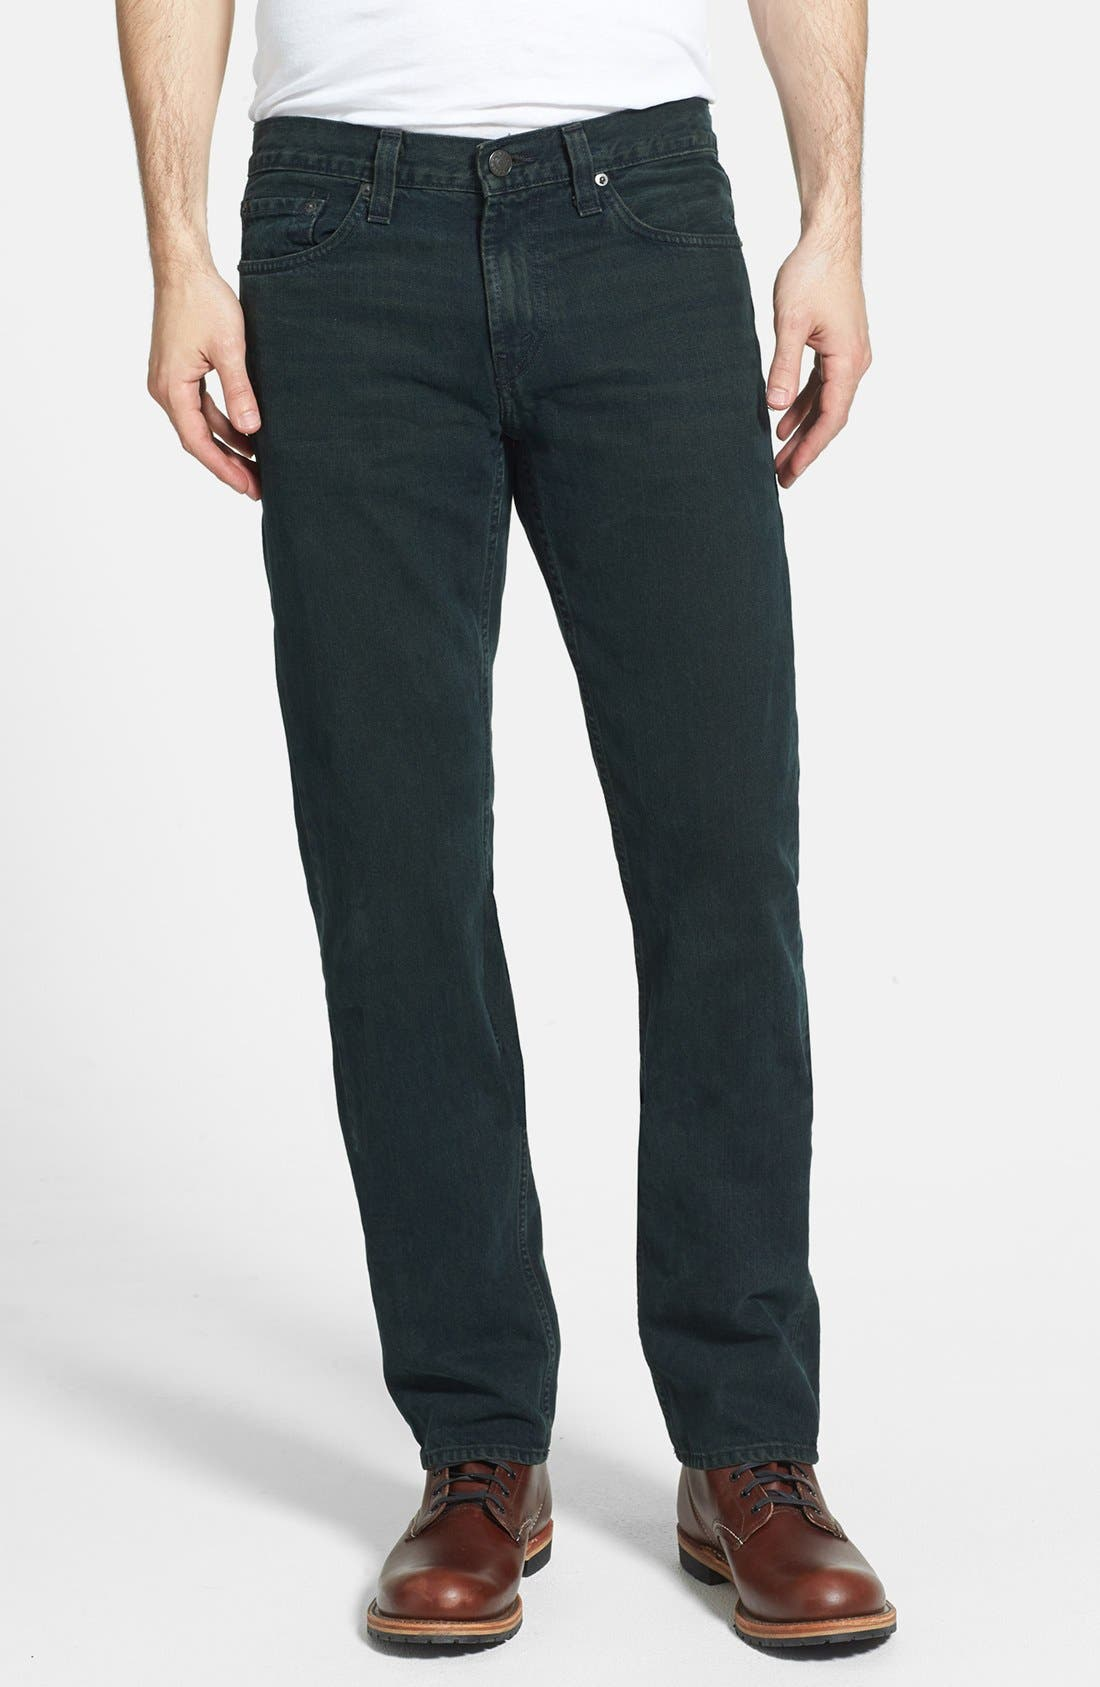 Alternate Image 1 Selected - J Brand 'Kane' Slim Fit Jeans